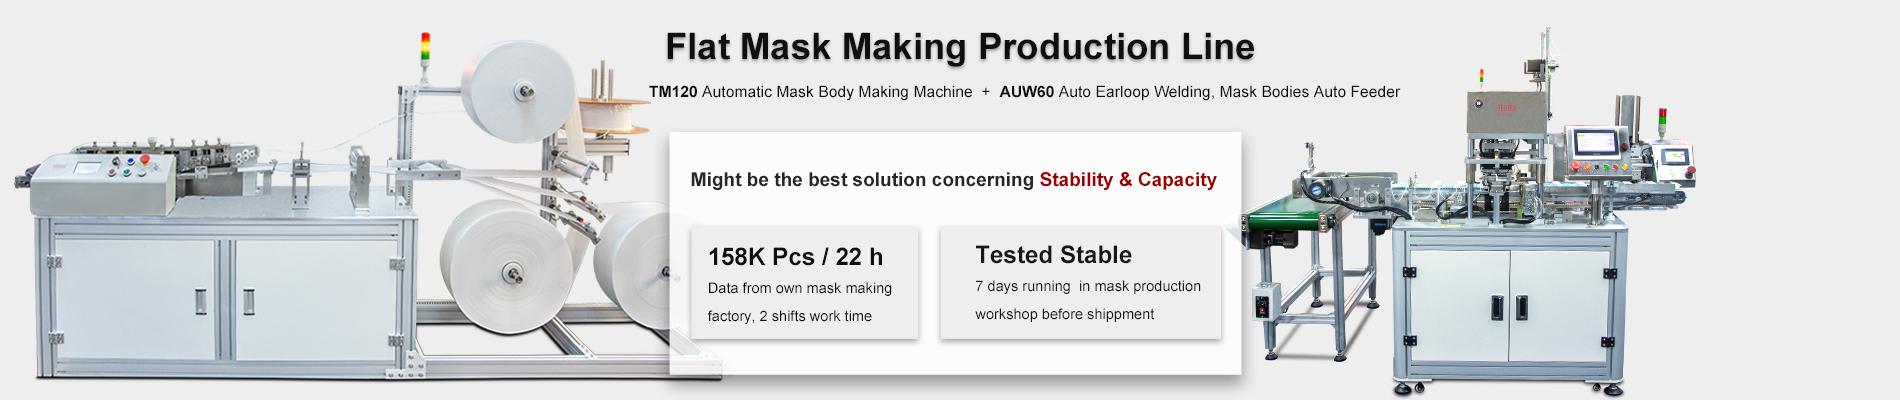 tm120+auw60 flat mask making machine